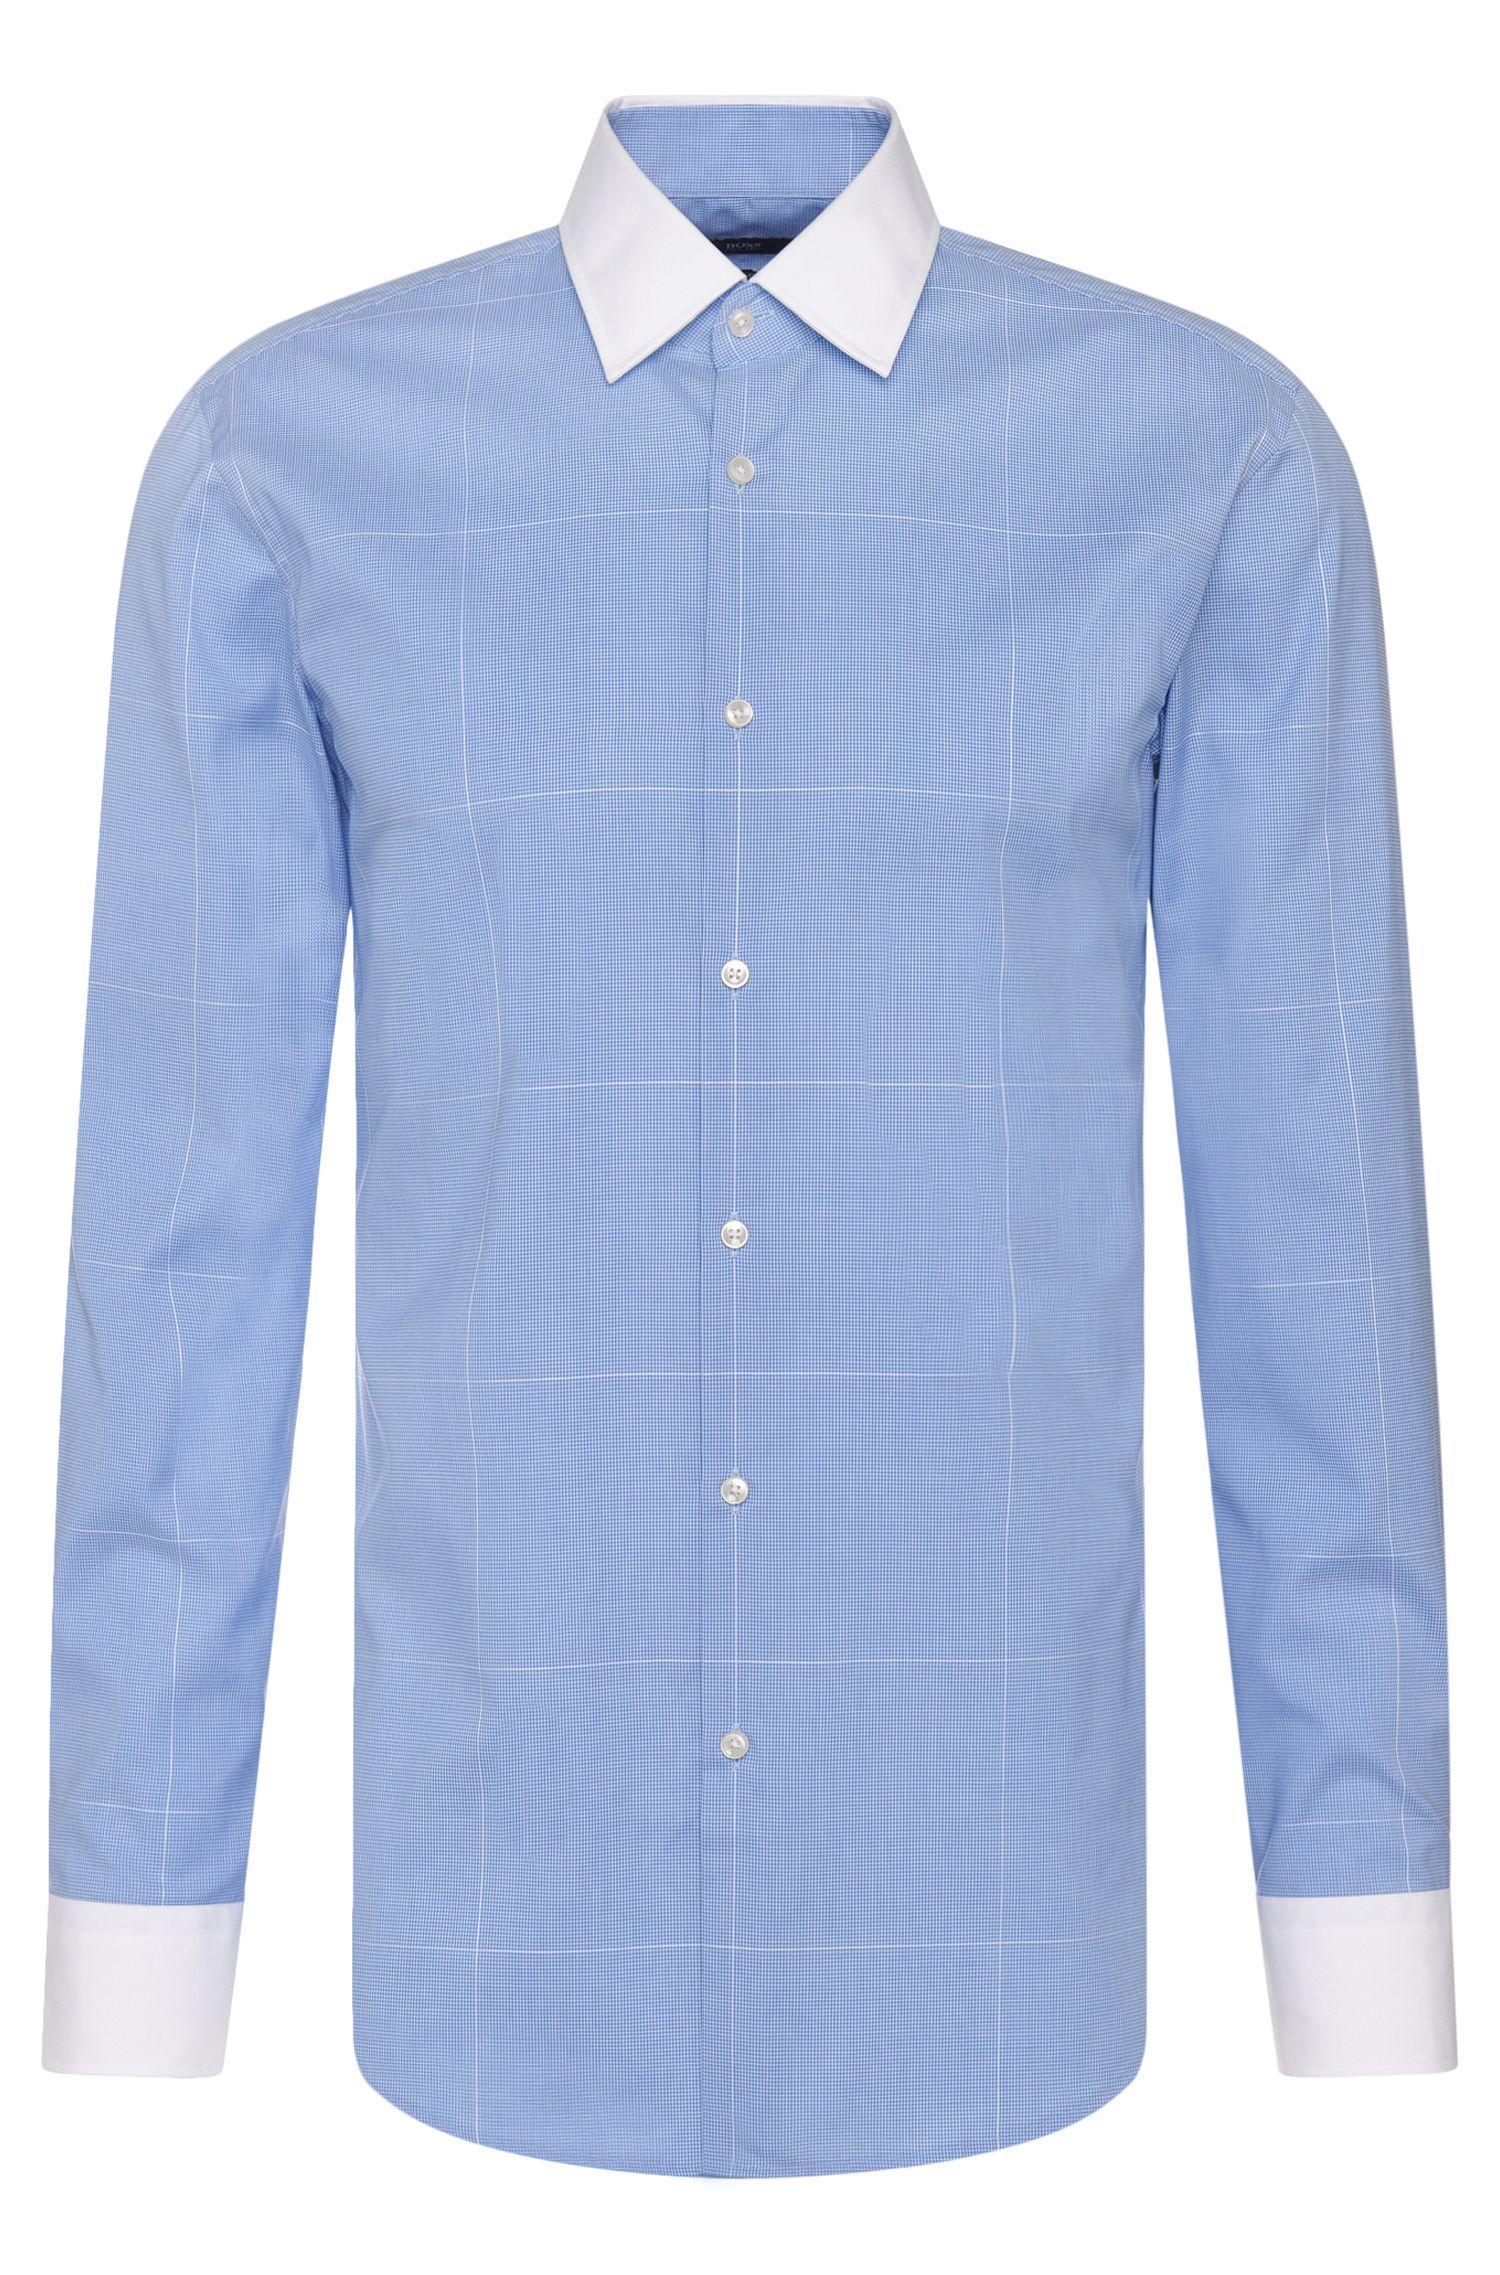 Windowpane Easy-Iron Cotton Dress Shirt, Slim Fit| Jonnes